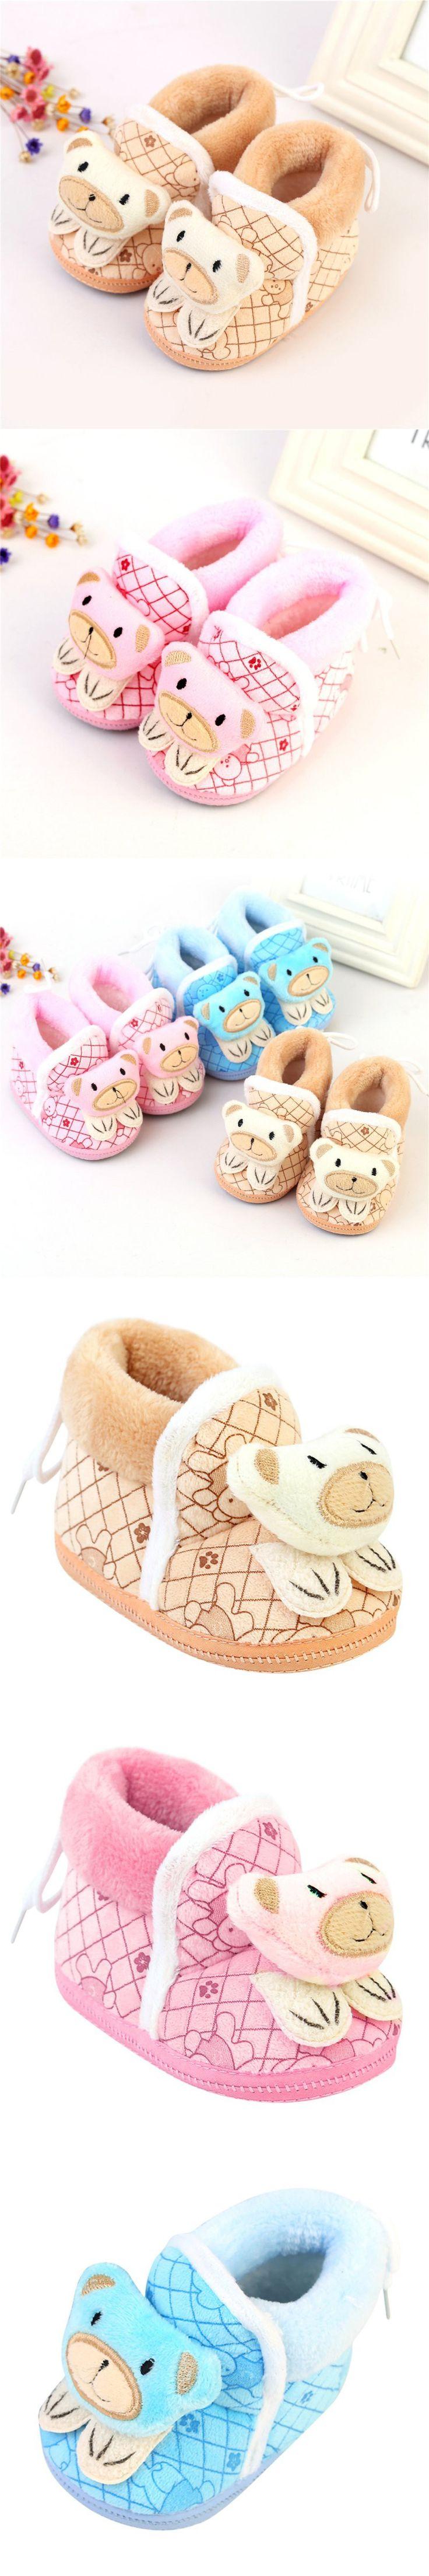 Cute Baby Girls Shoes Soft Bottom Flats Soft Slippers Shoes Prewalker $2.49